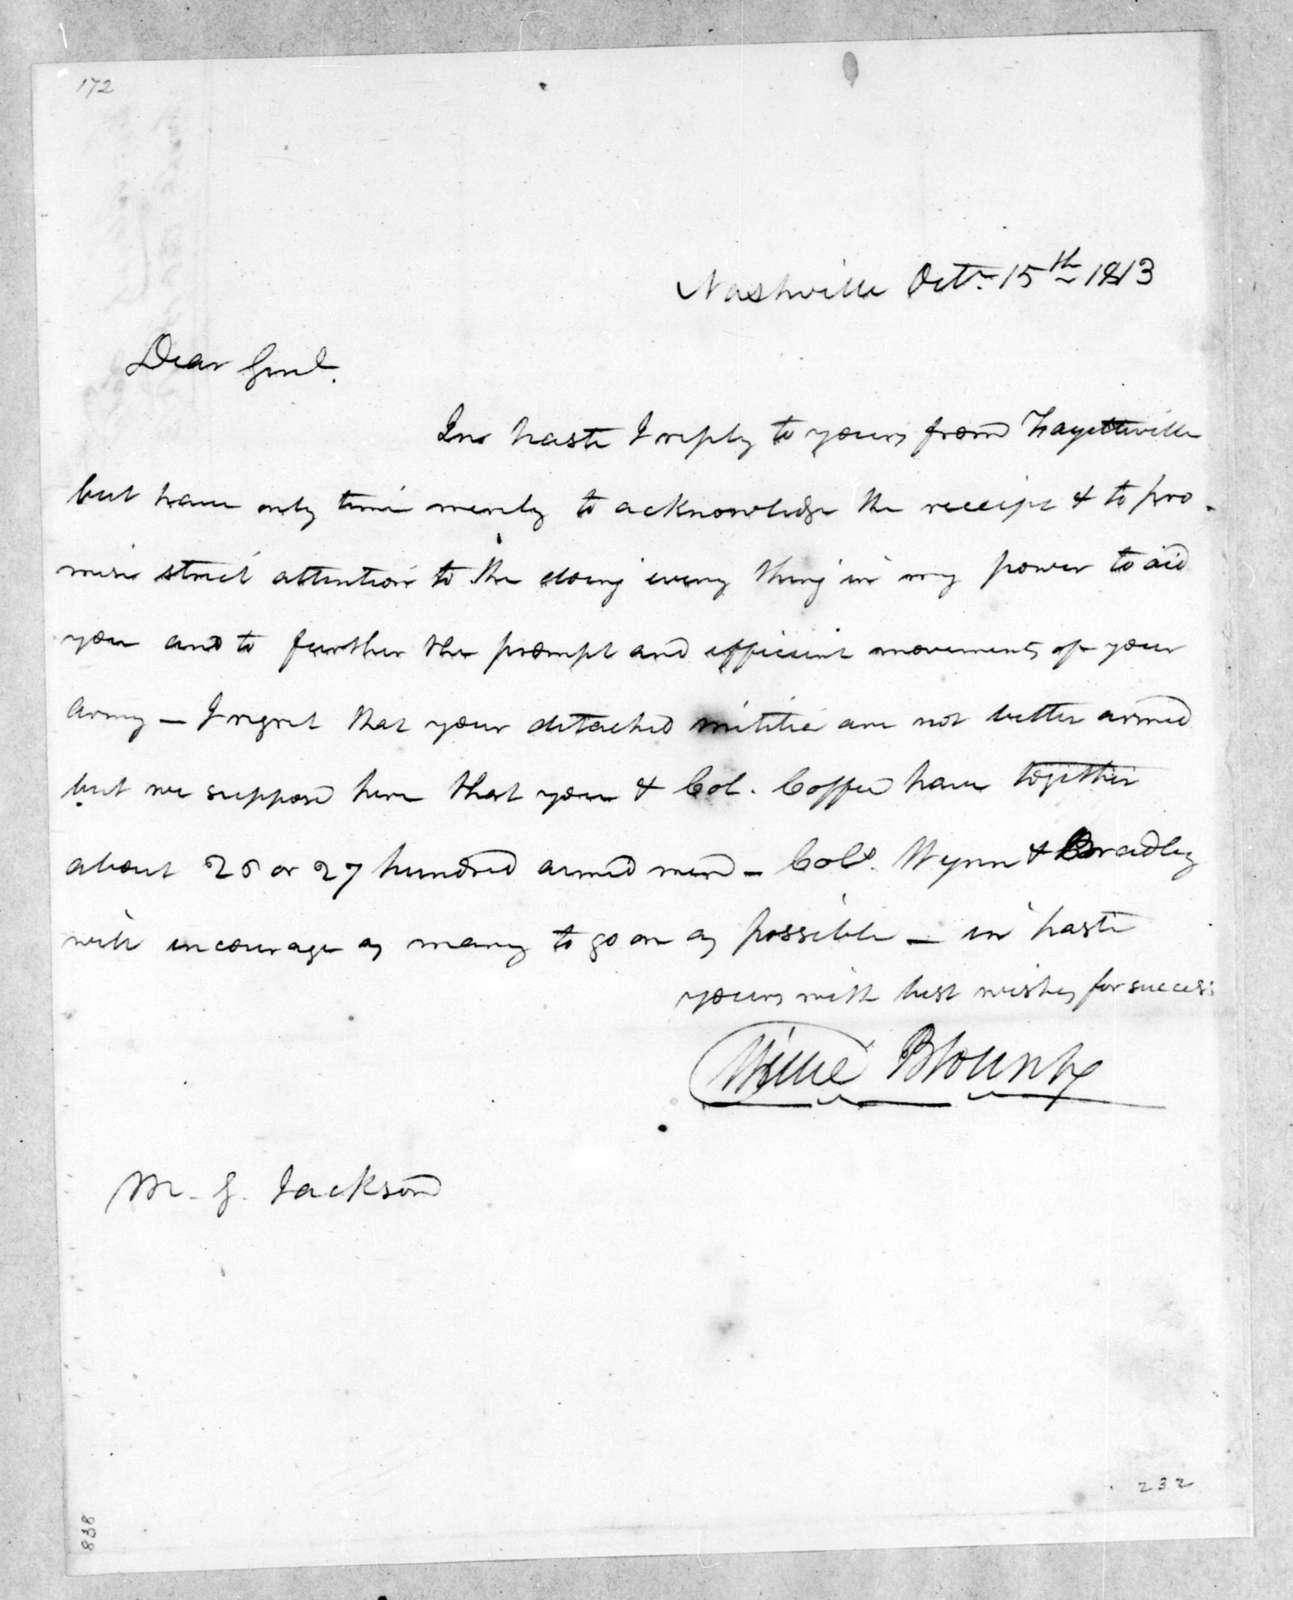 Willie Blount to Andrew Jackson, October 15, 1813